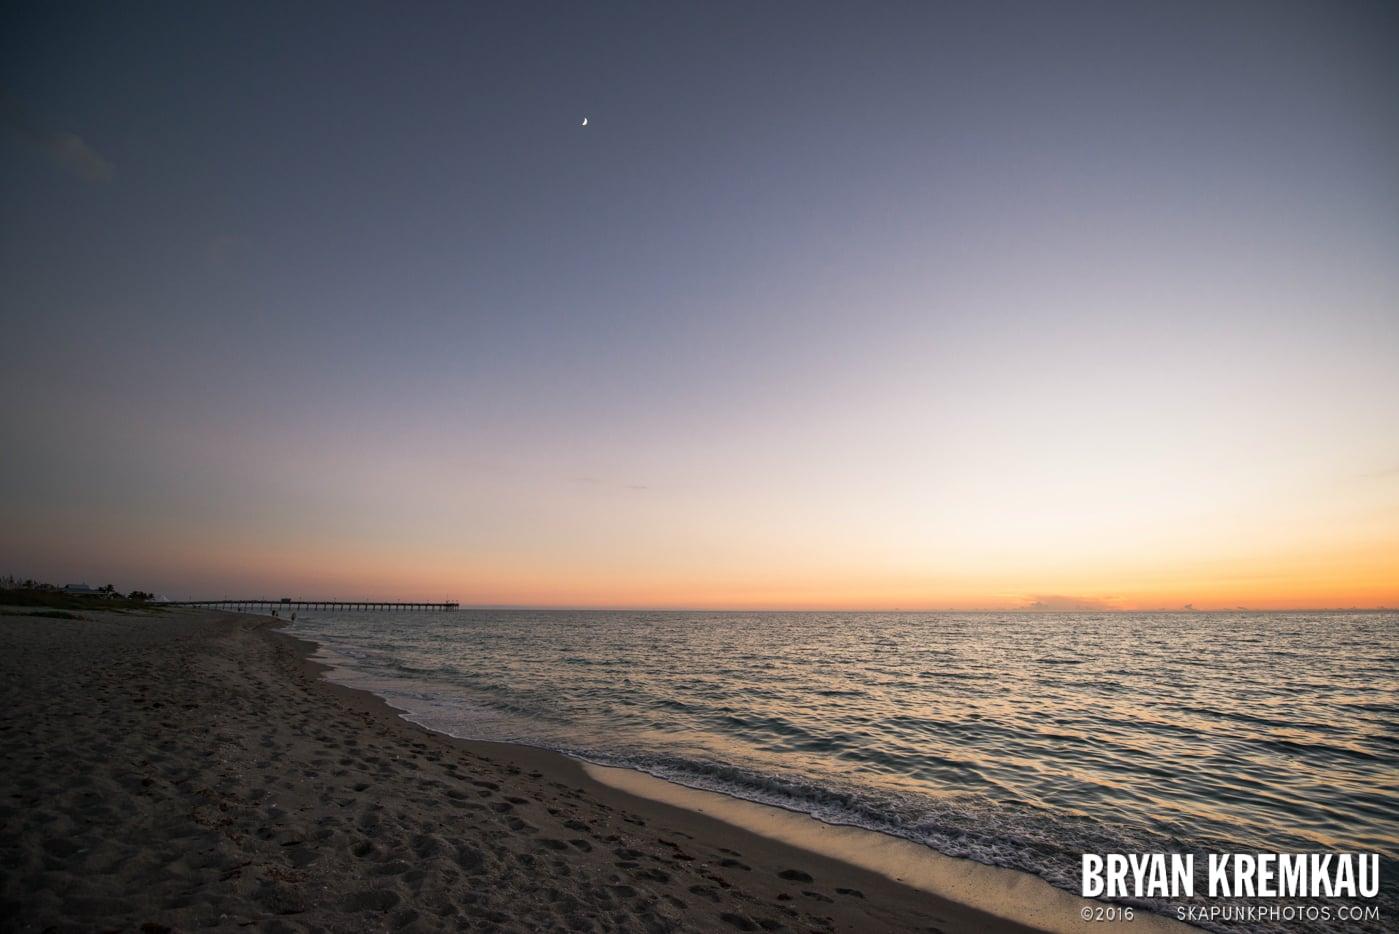 Sunsets, Astrophotography & Birds @ Venice, Florida - 10.25.14 - 11.5.14 (110)